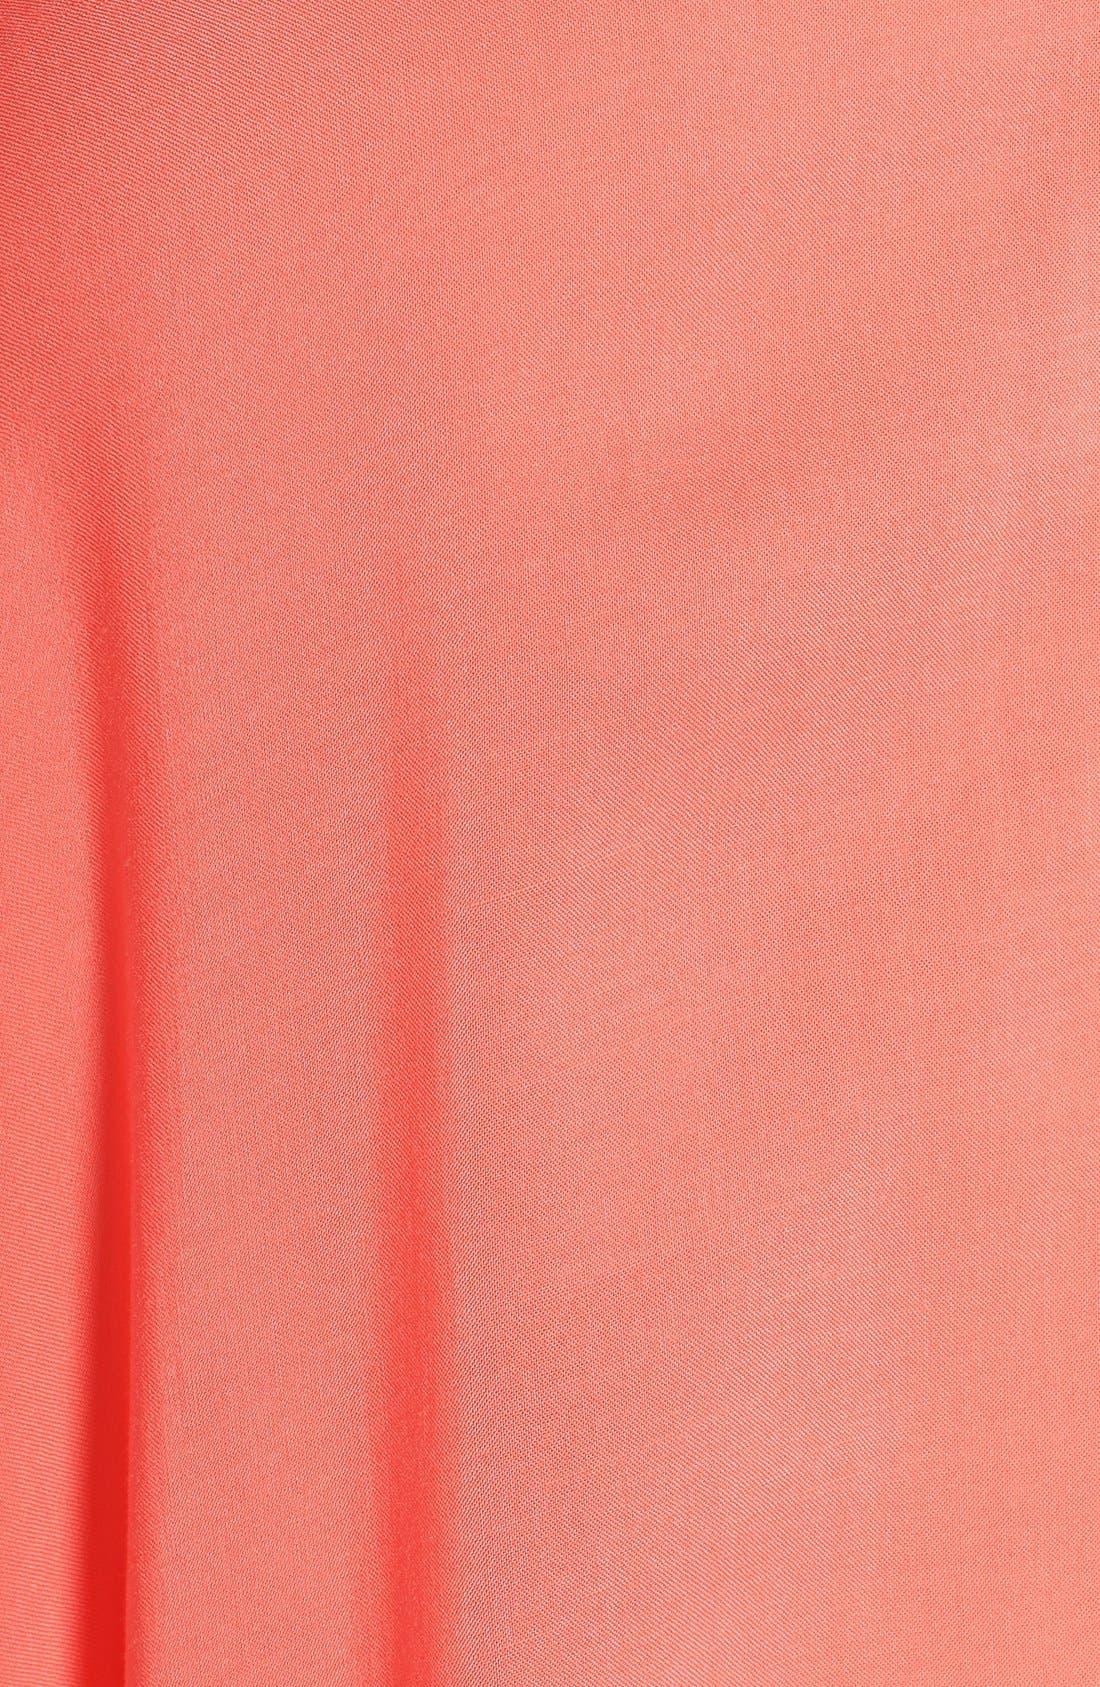 Cover-Up Maxi Dress,                             Alternate thumbnail 49, color,